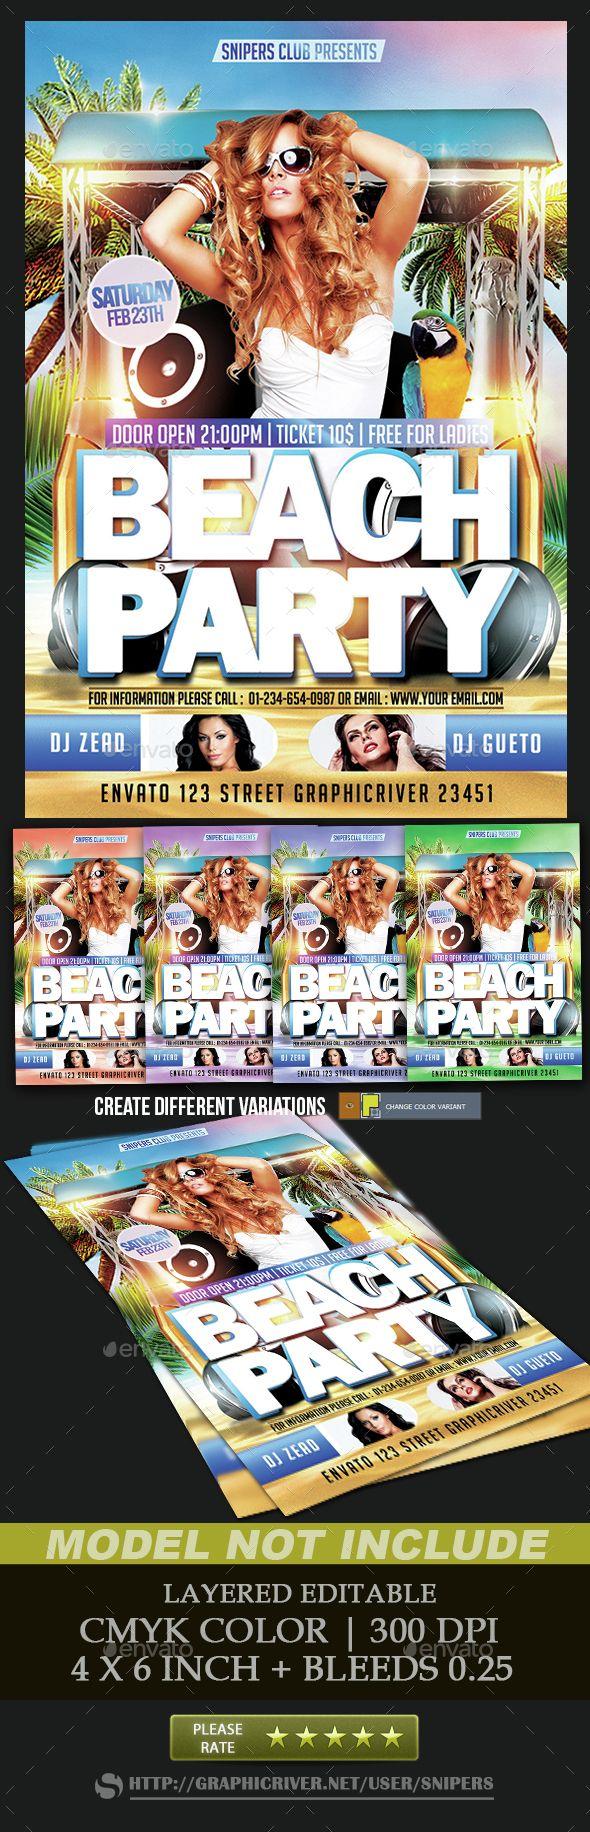 Beach Party Flyer,beach, blue, club, design, dj, event, flyer, fresh, hot, lights, music, palm, party, poster, print, psd, sand, sea, Snipers, sound wave, splash, spring, summer, sun, sunset, sunshine, surf, template, tropical, water